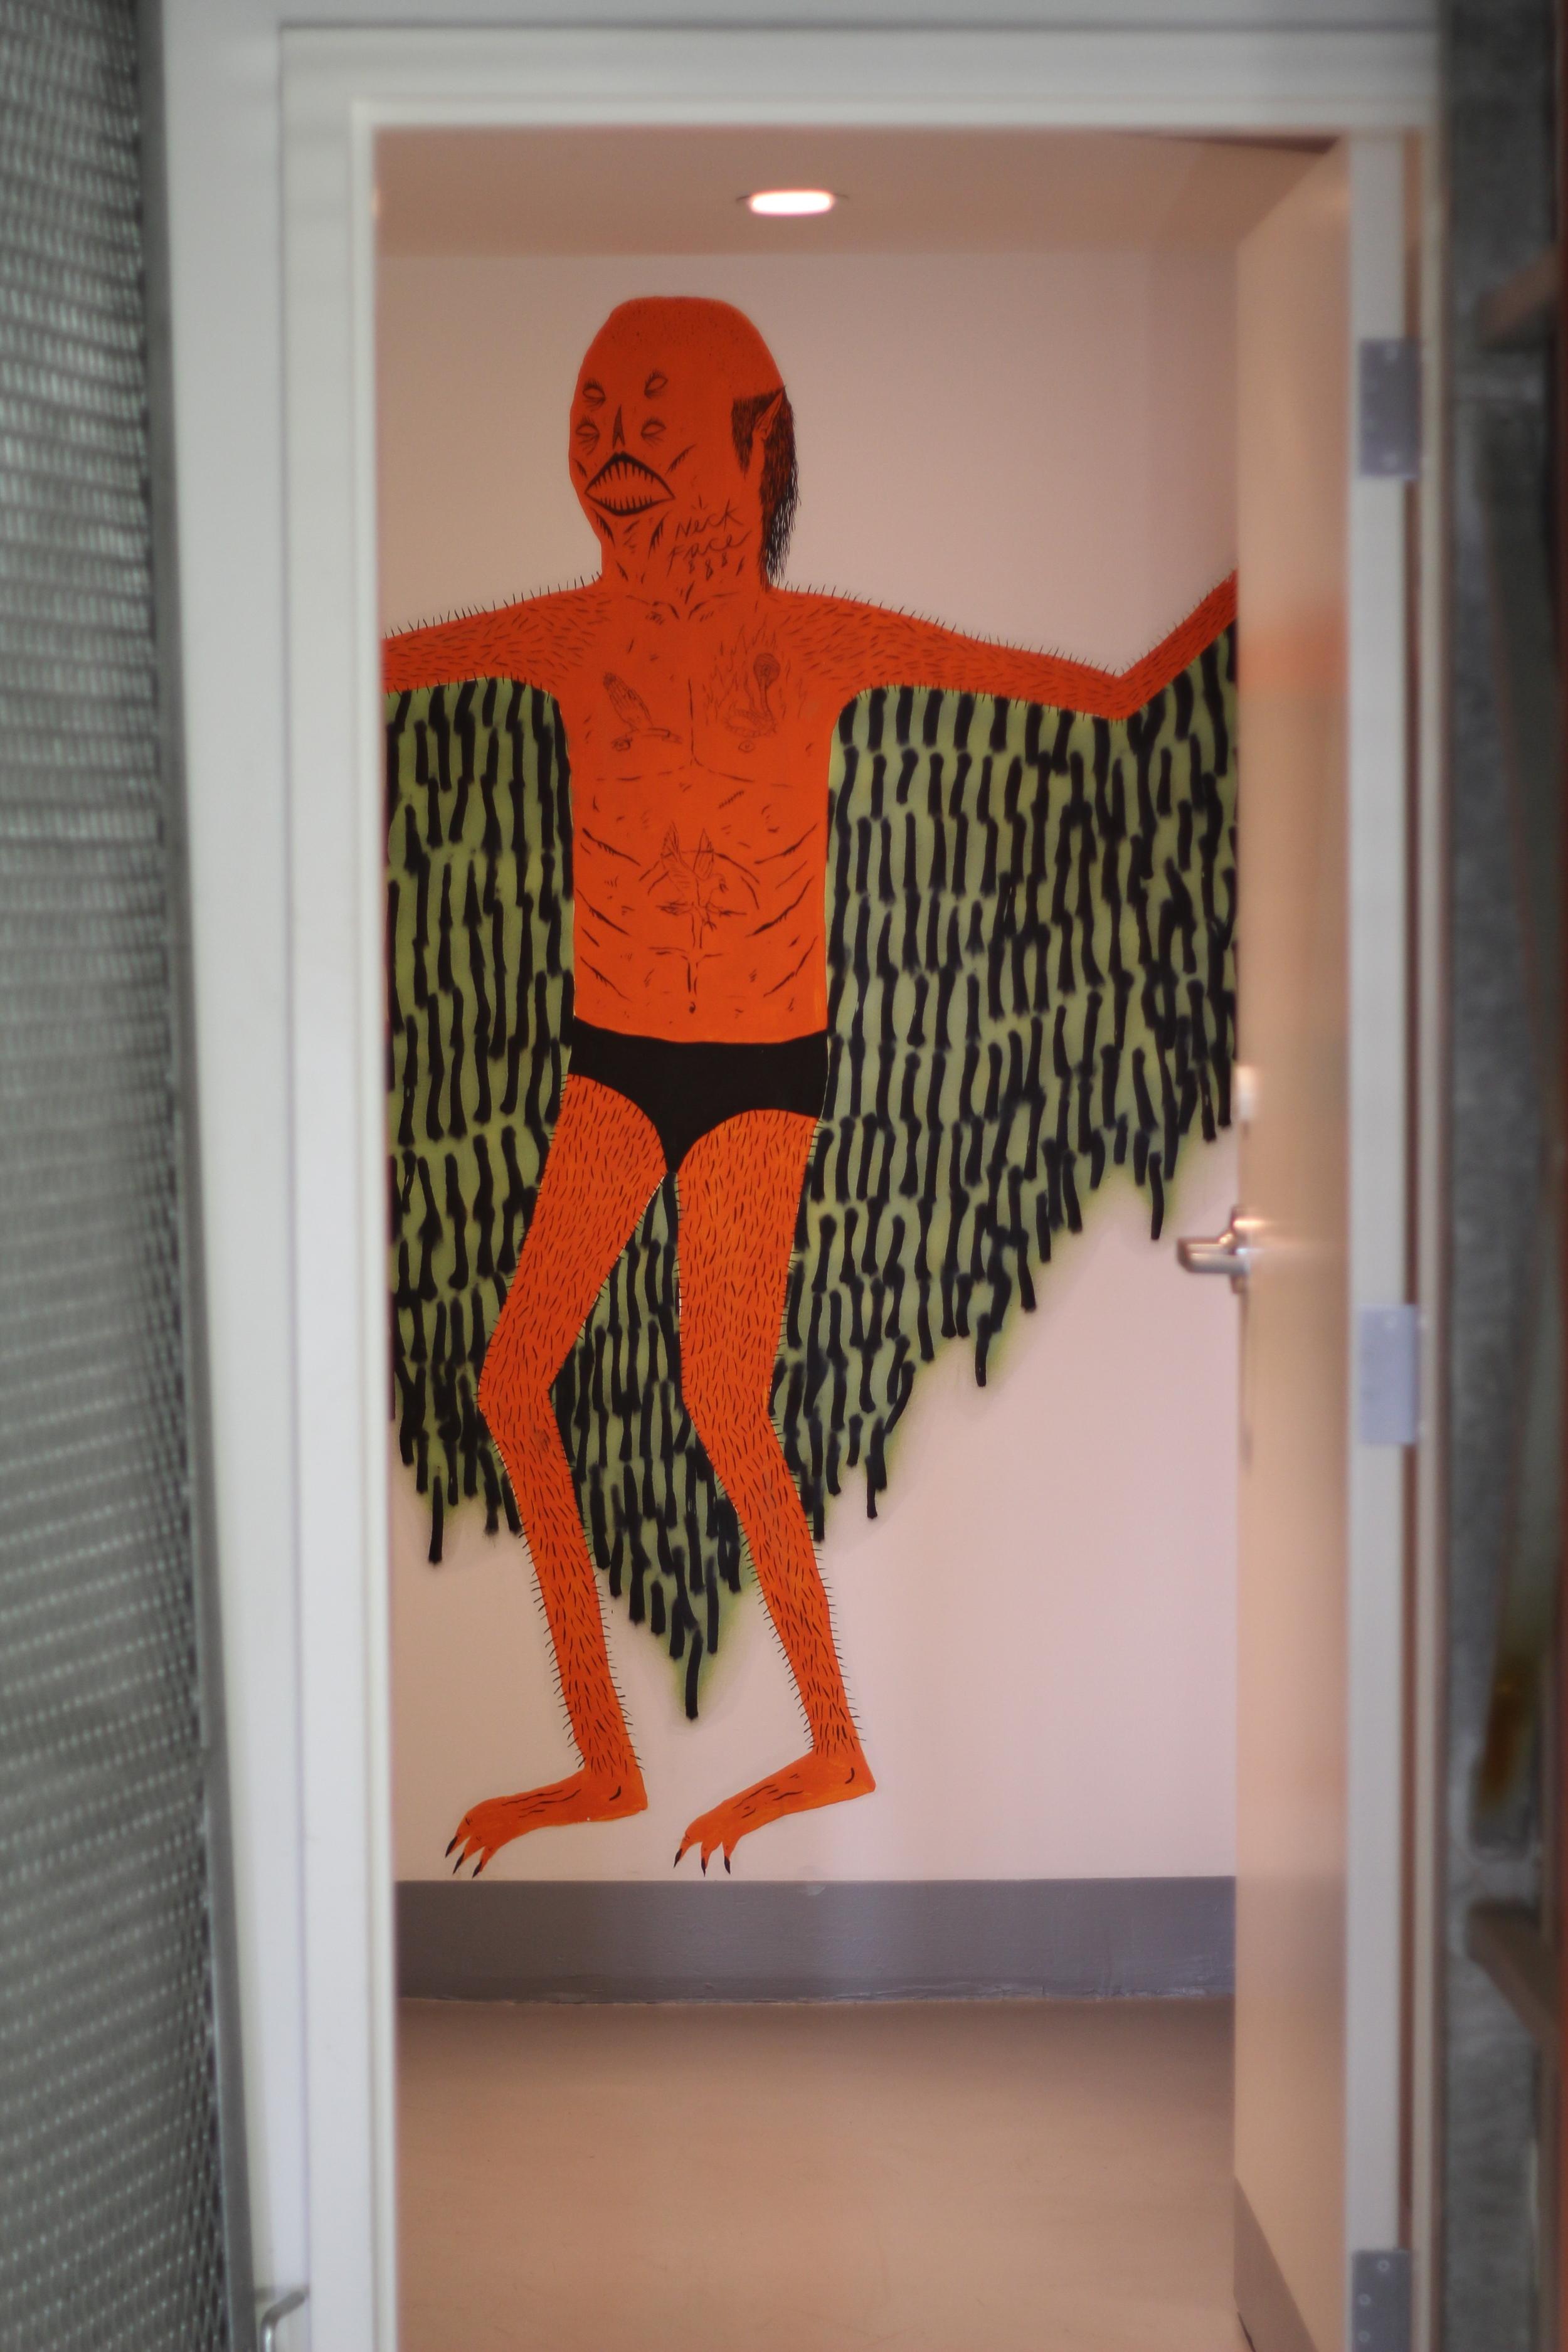 Supreme store bathroom - Hollywood, CA